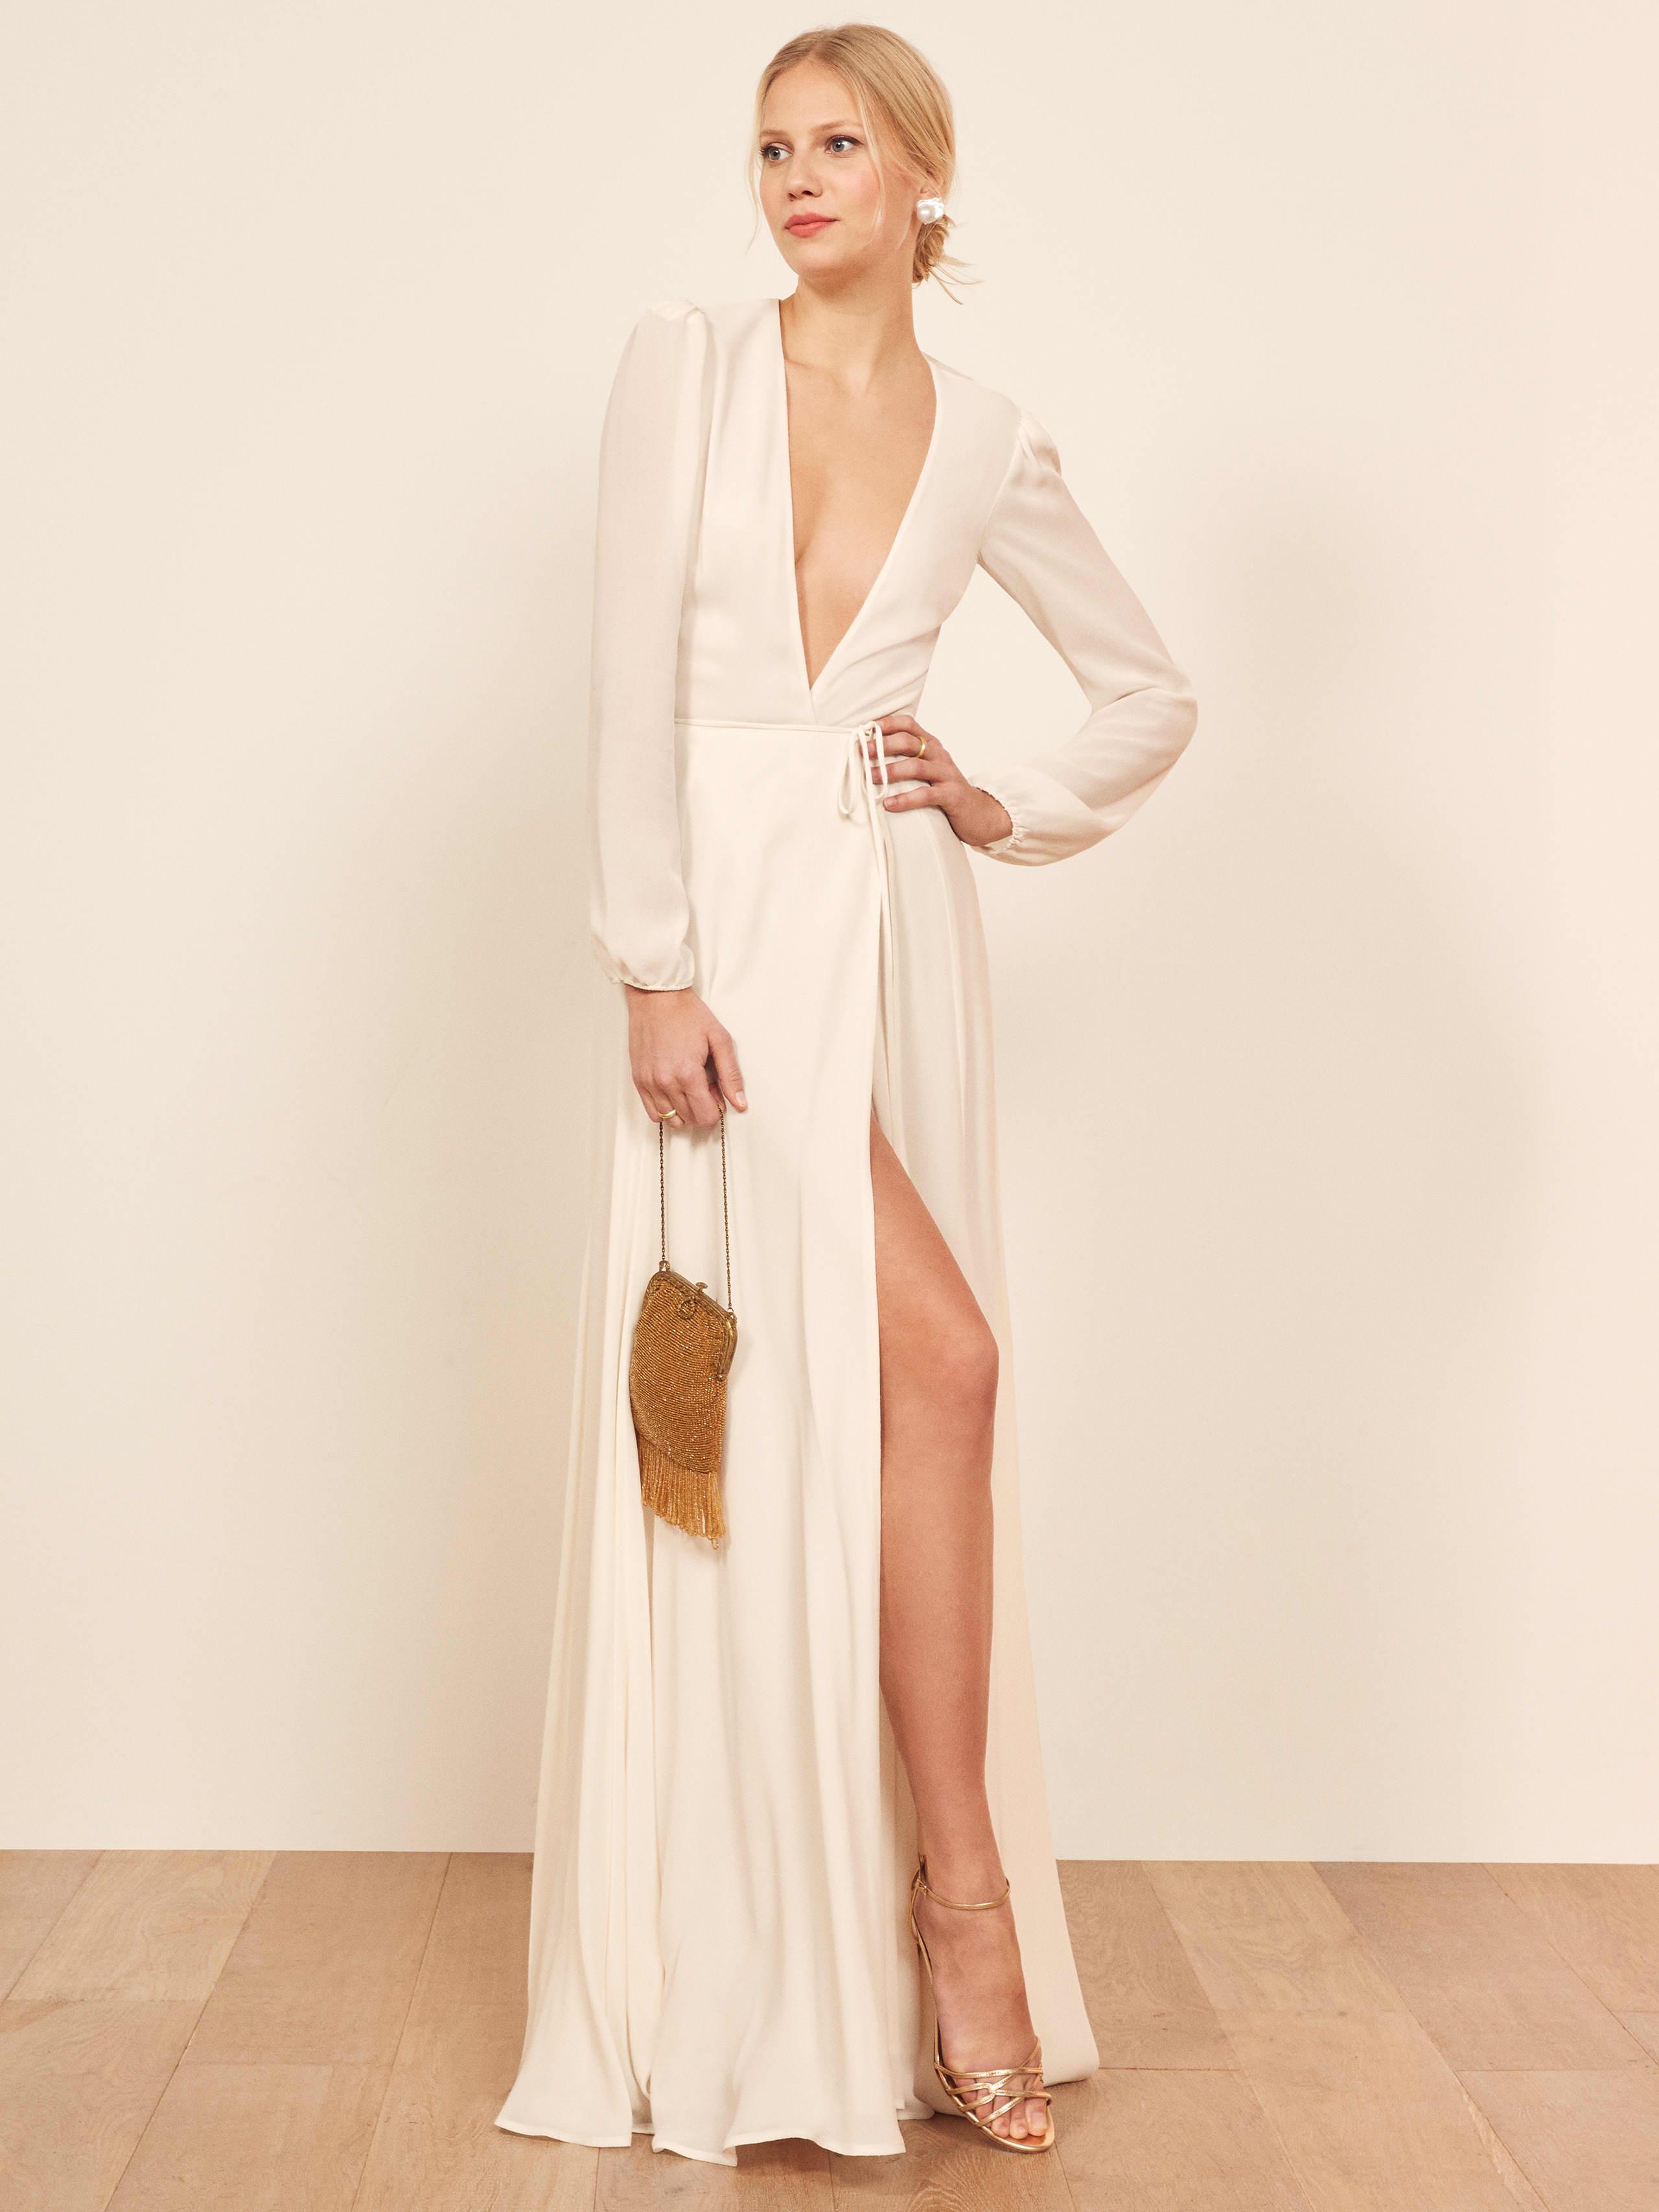 2fc65135475bb Weddings   Parties - Shop Party Dresses - Reformation